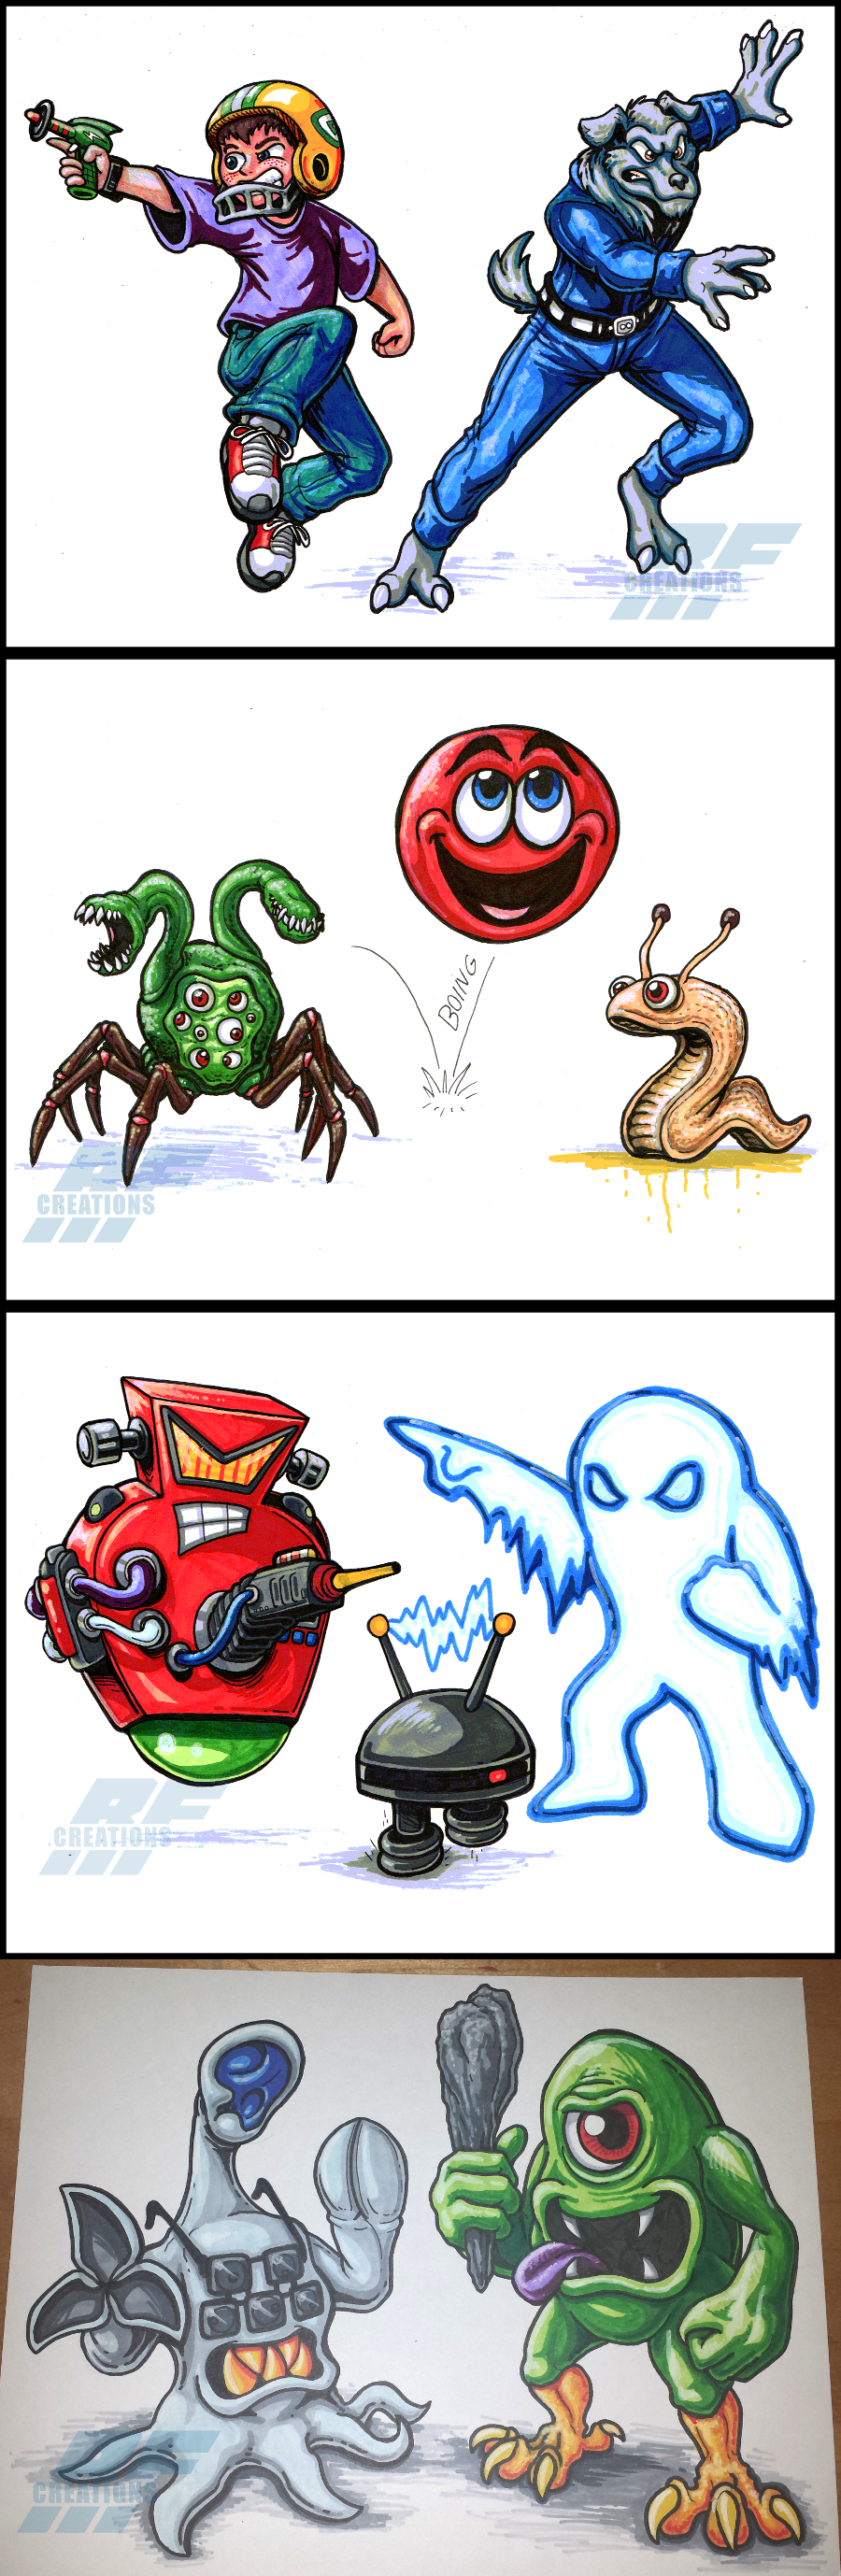 Inktober Stuff 1 - Commander Keen marker sketches by ...